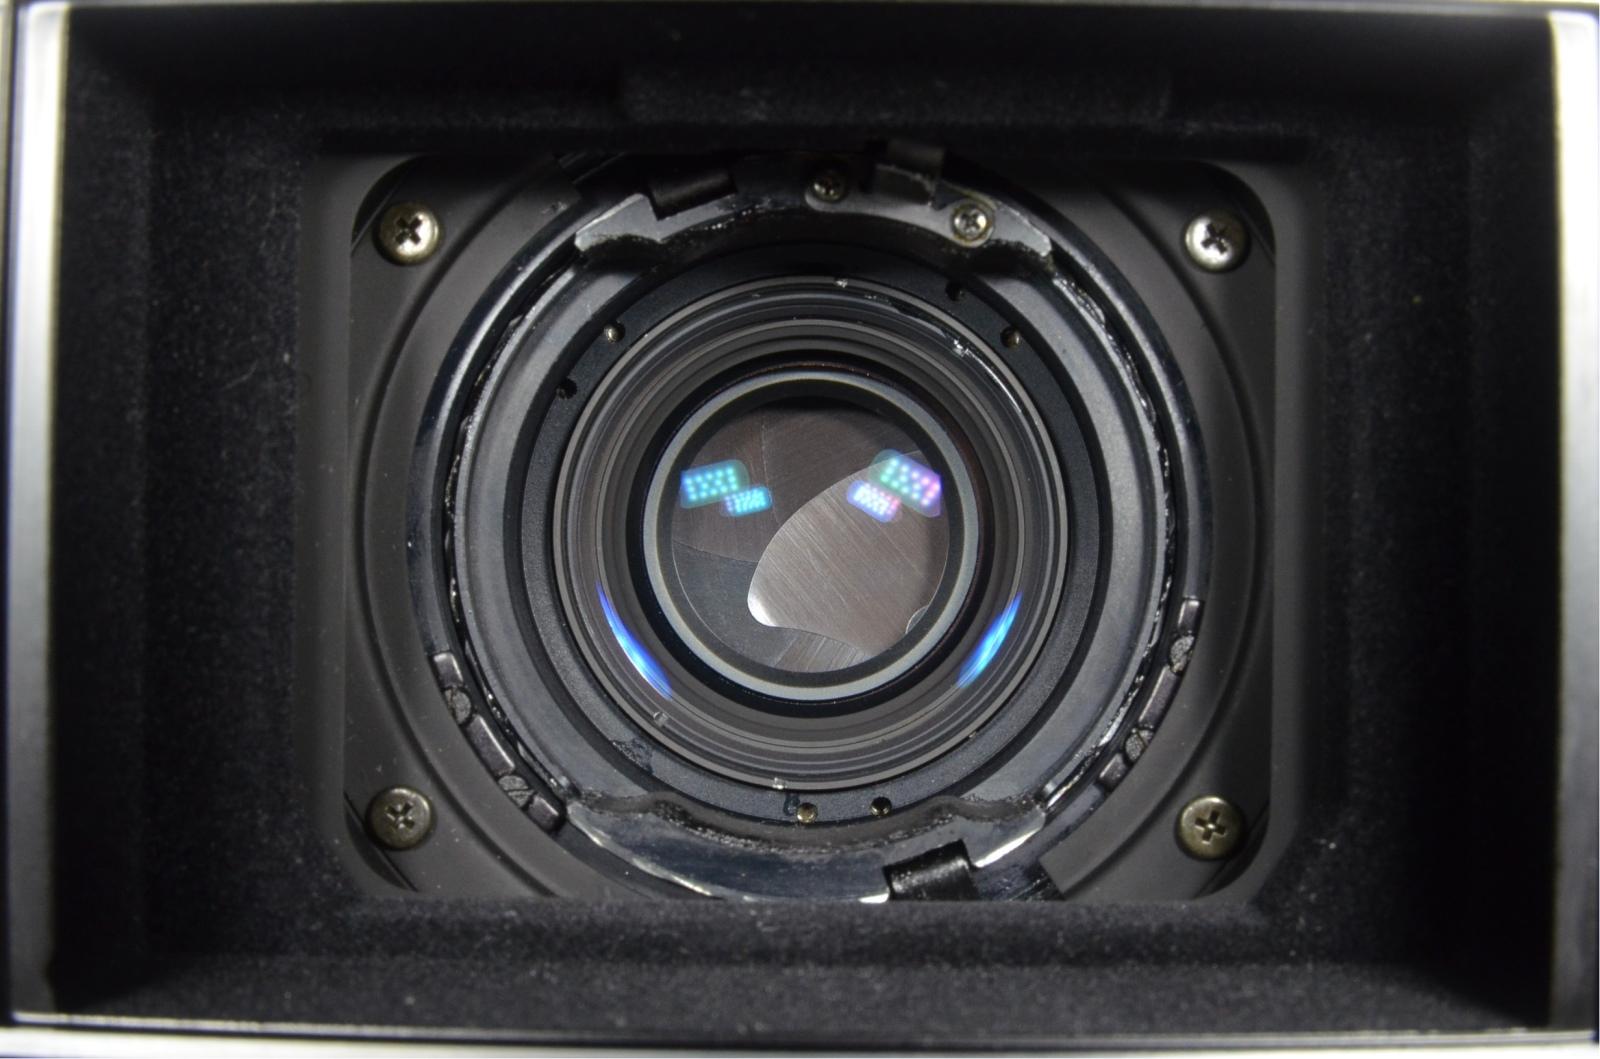 ... fuji fujifilm gw690iii 90mm f3.5 medium format count only ' ...